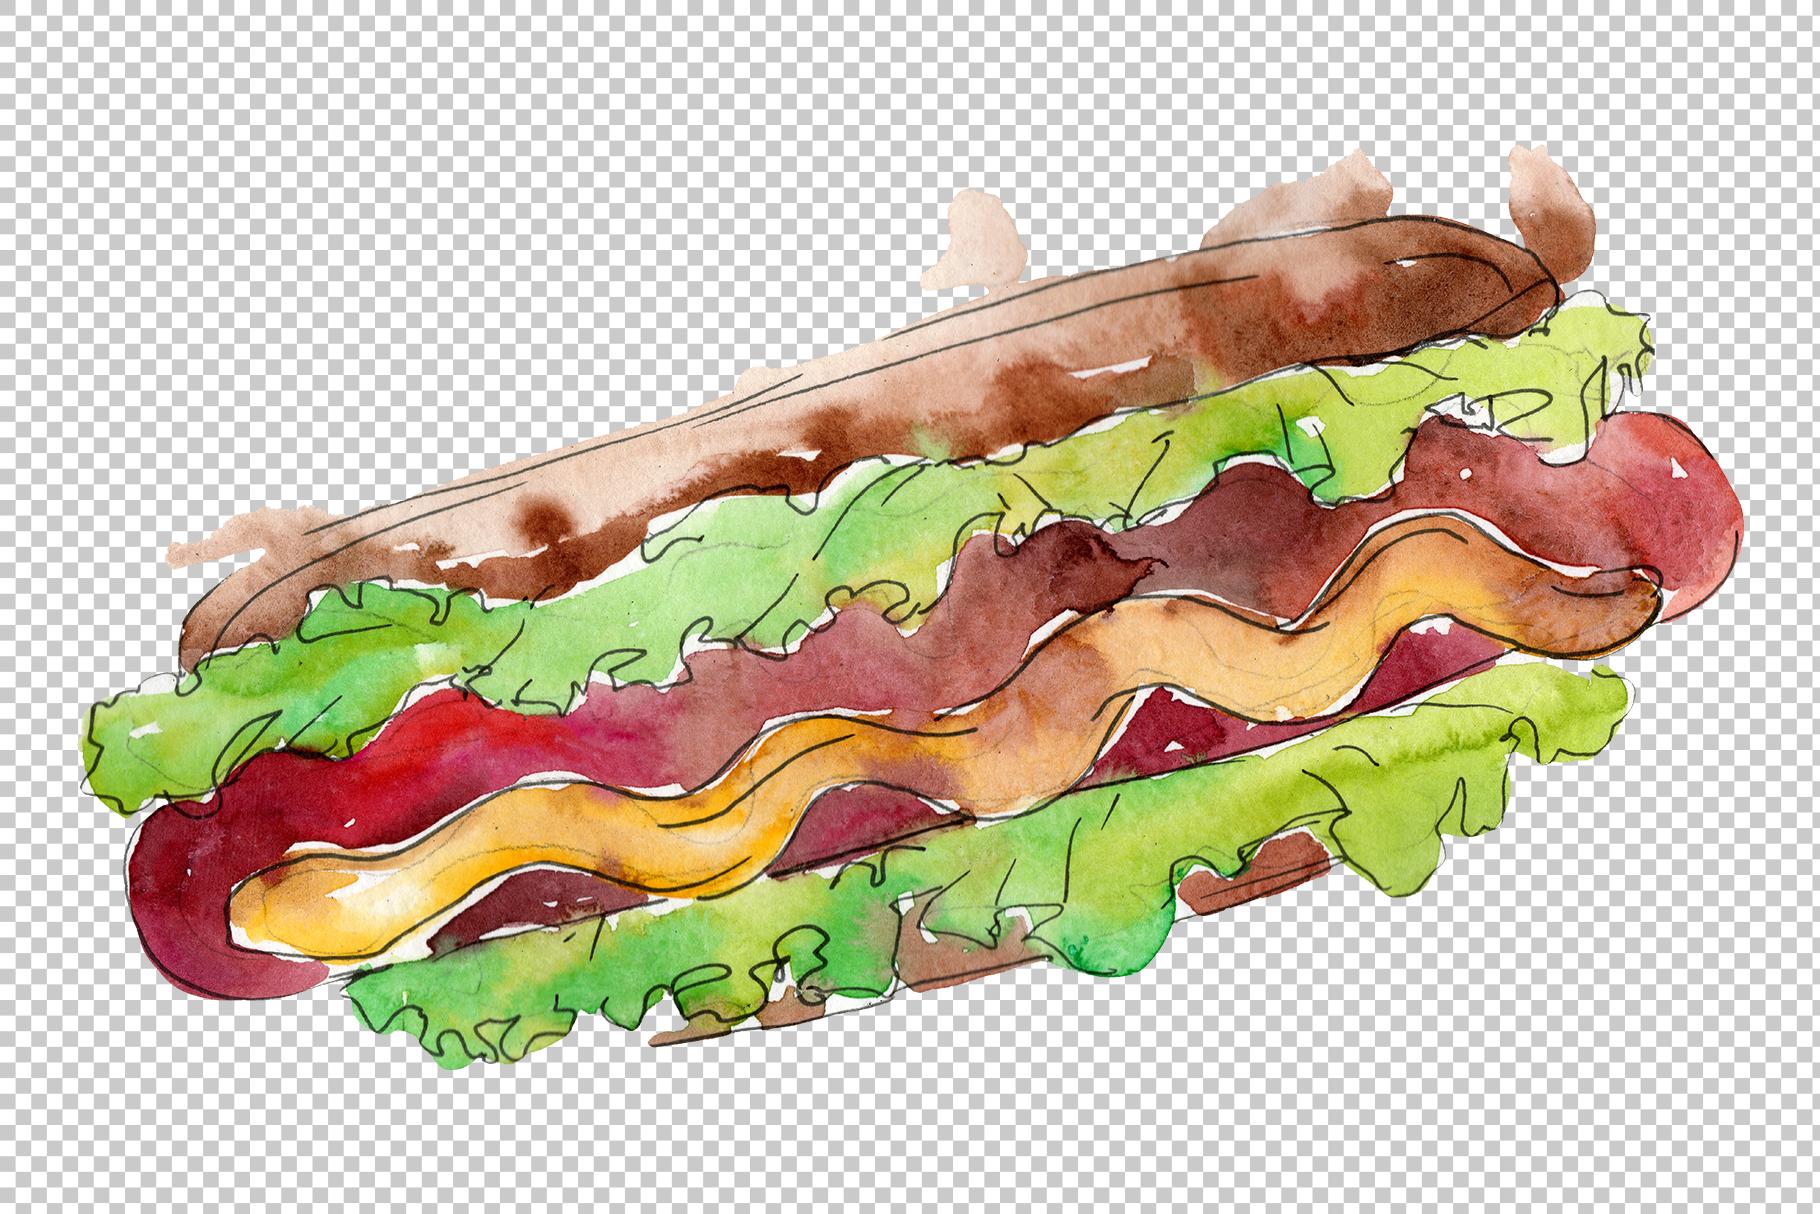 Hot dog in Ukrainian watercolor png example image 2